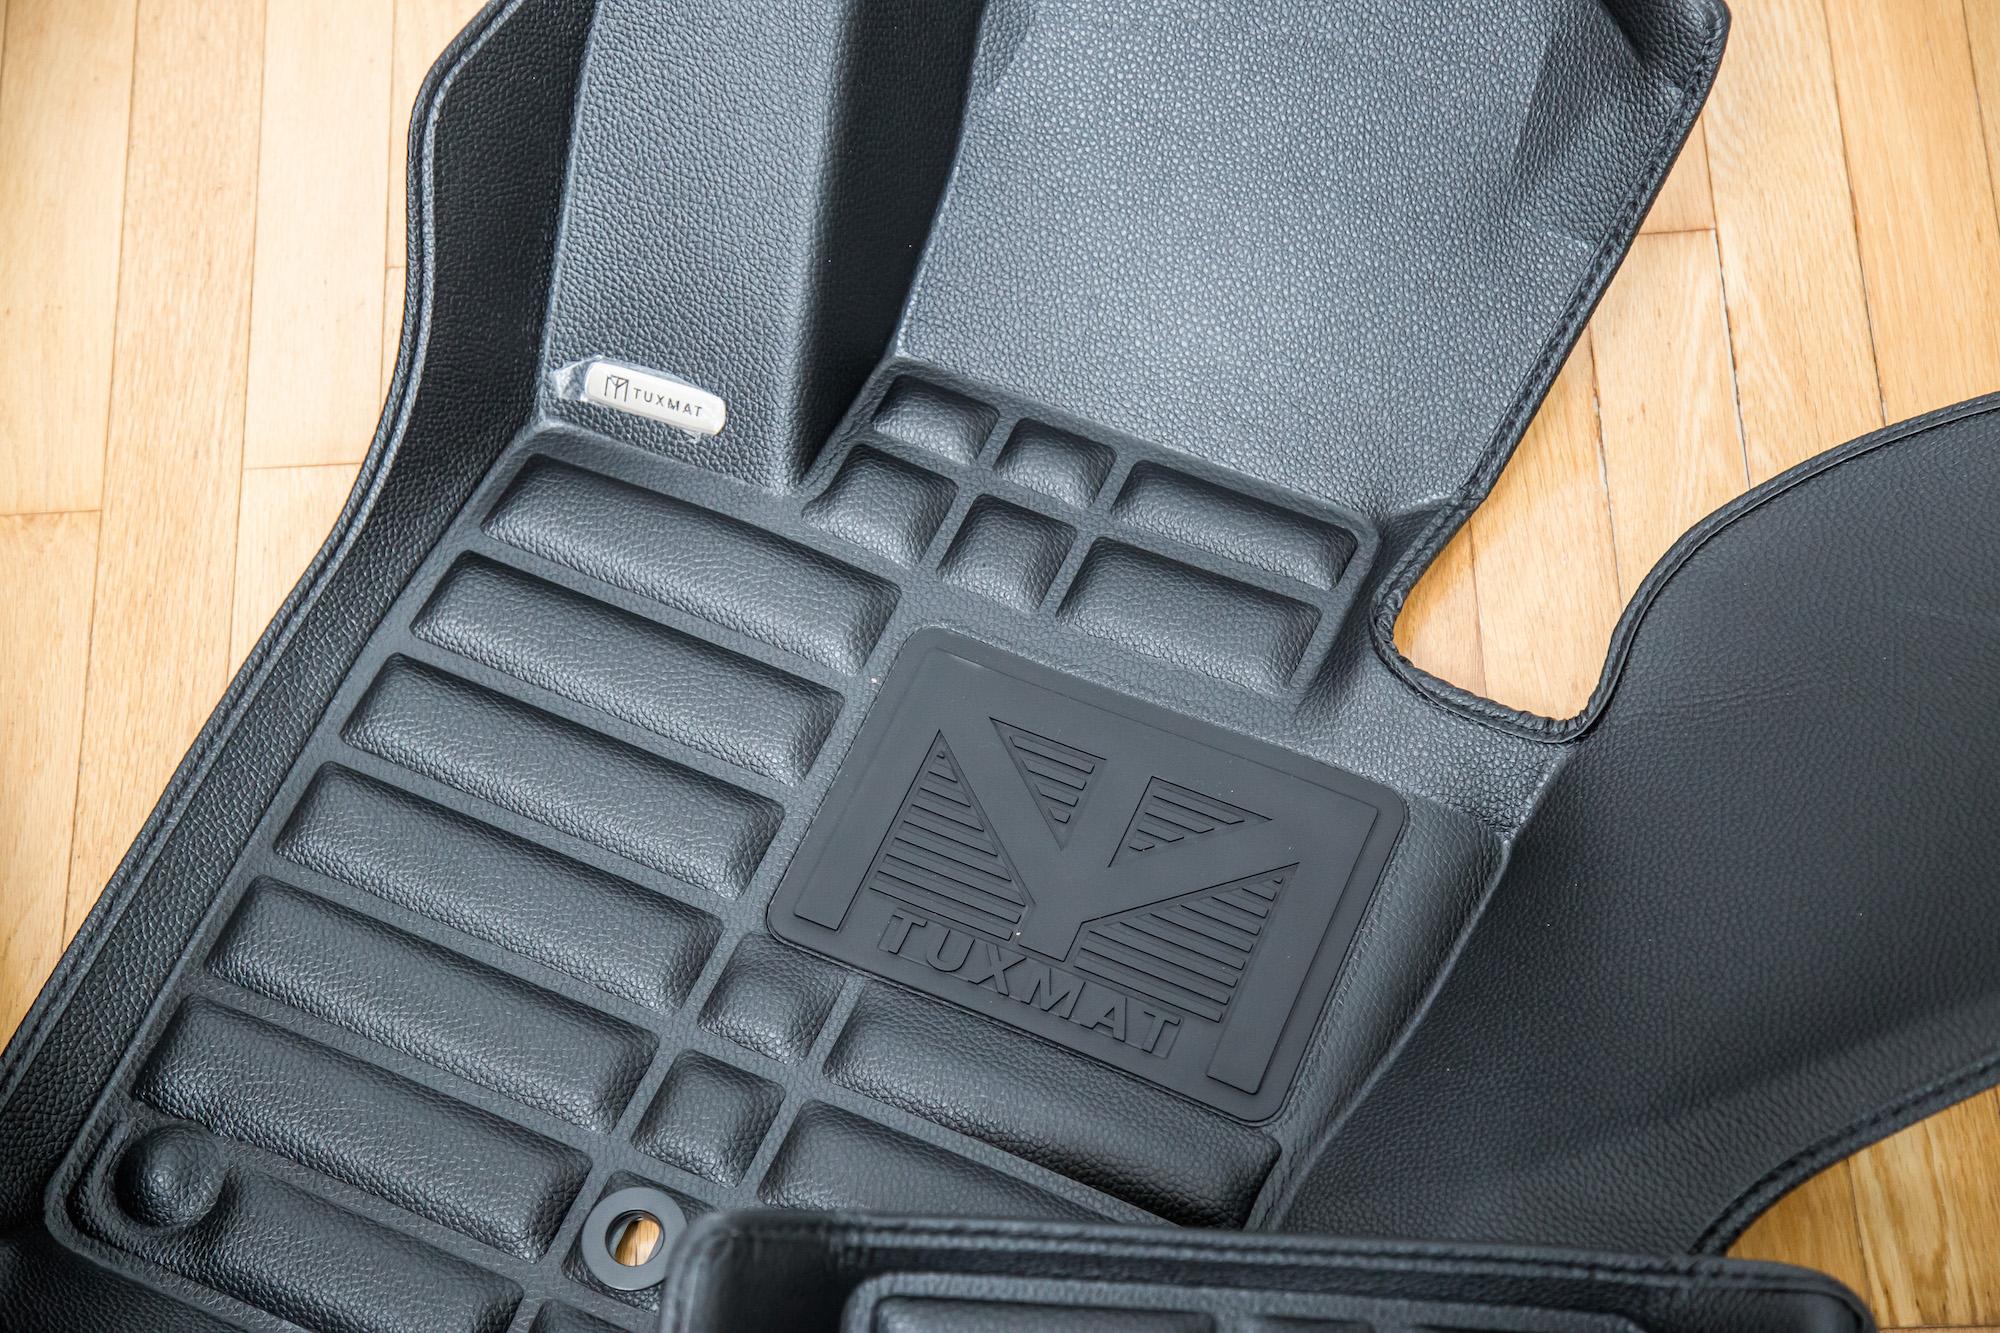 Review: TuxMat Custom Car Floor Mats